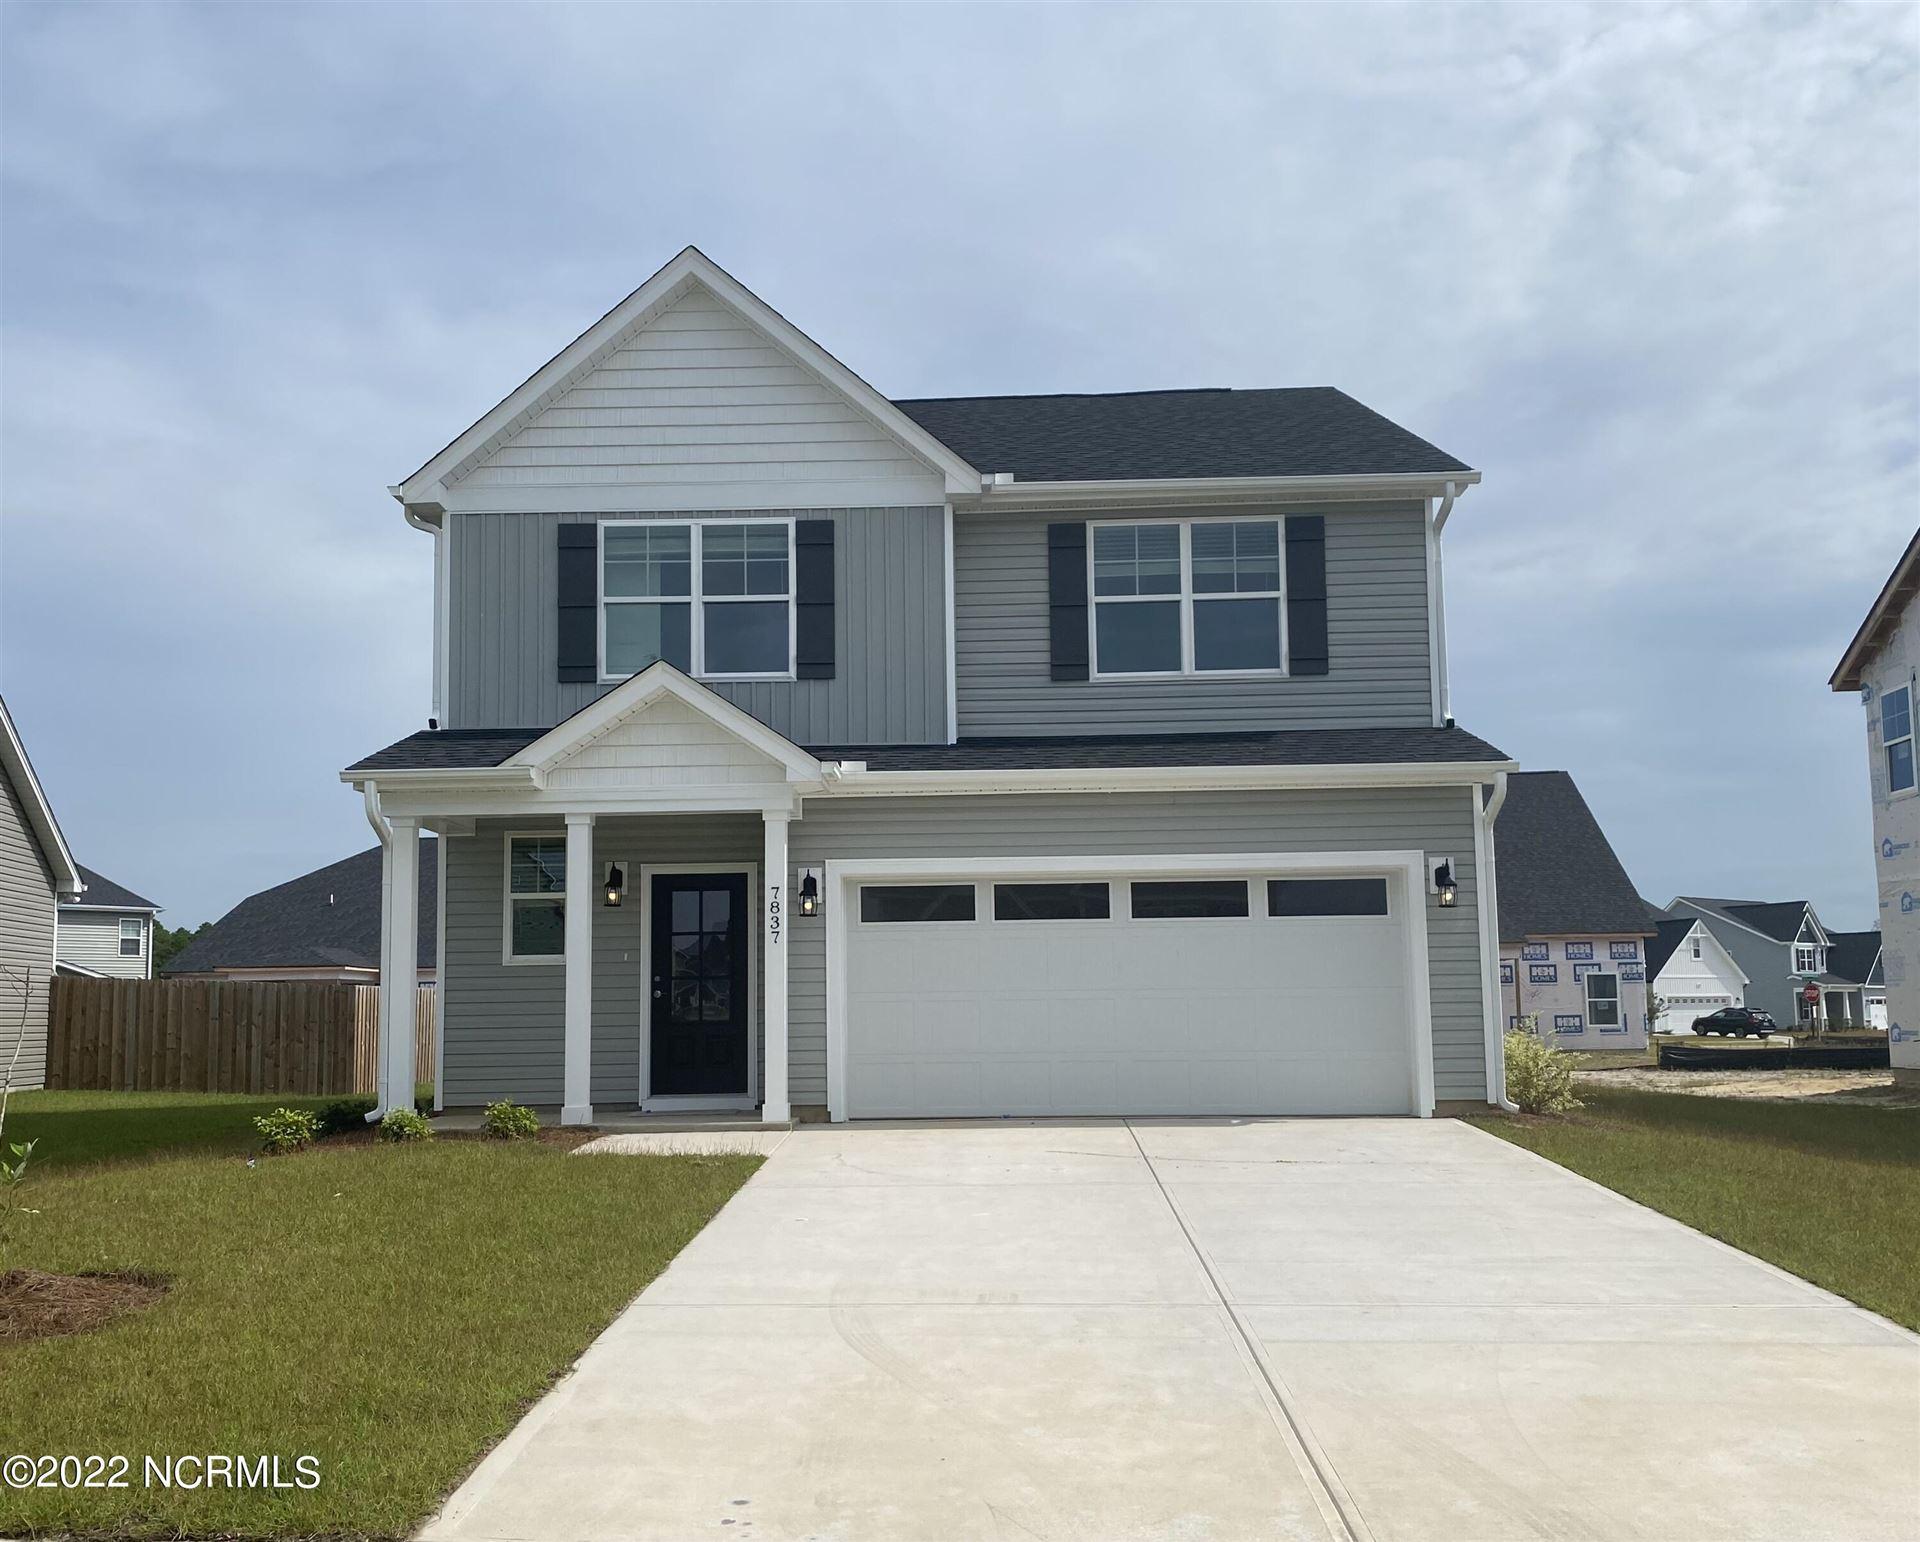 Photo of 7837 Waterwillow Drive, Leland, NC 28451 (MLS # 100278019)